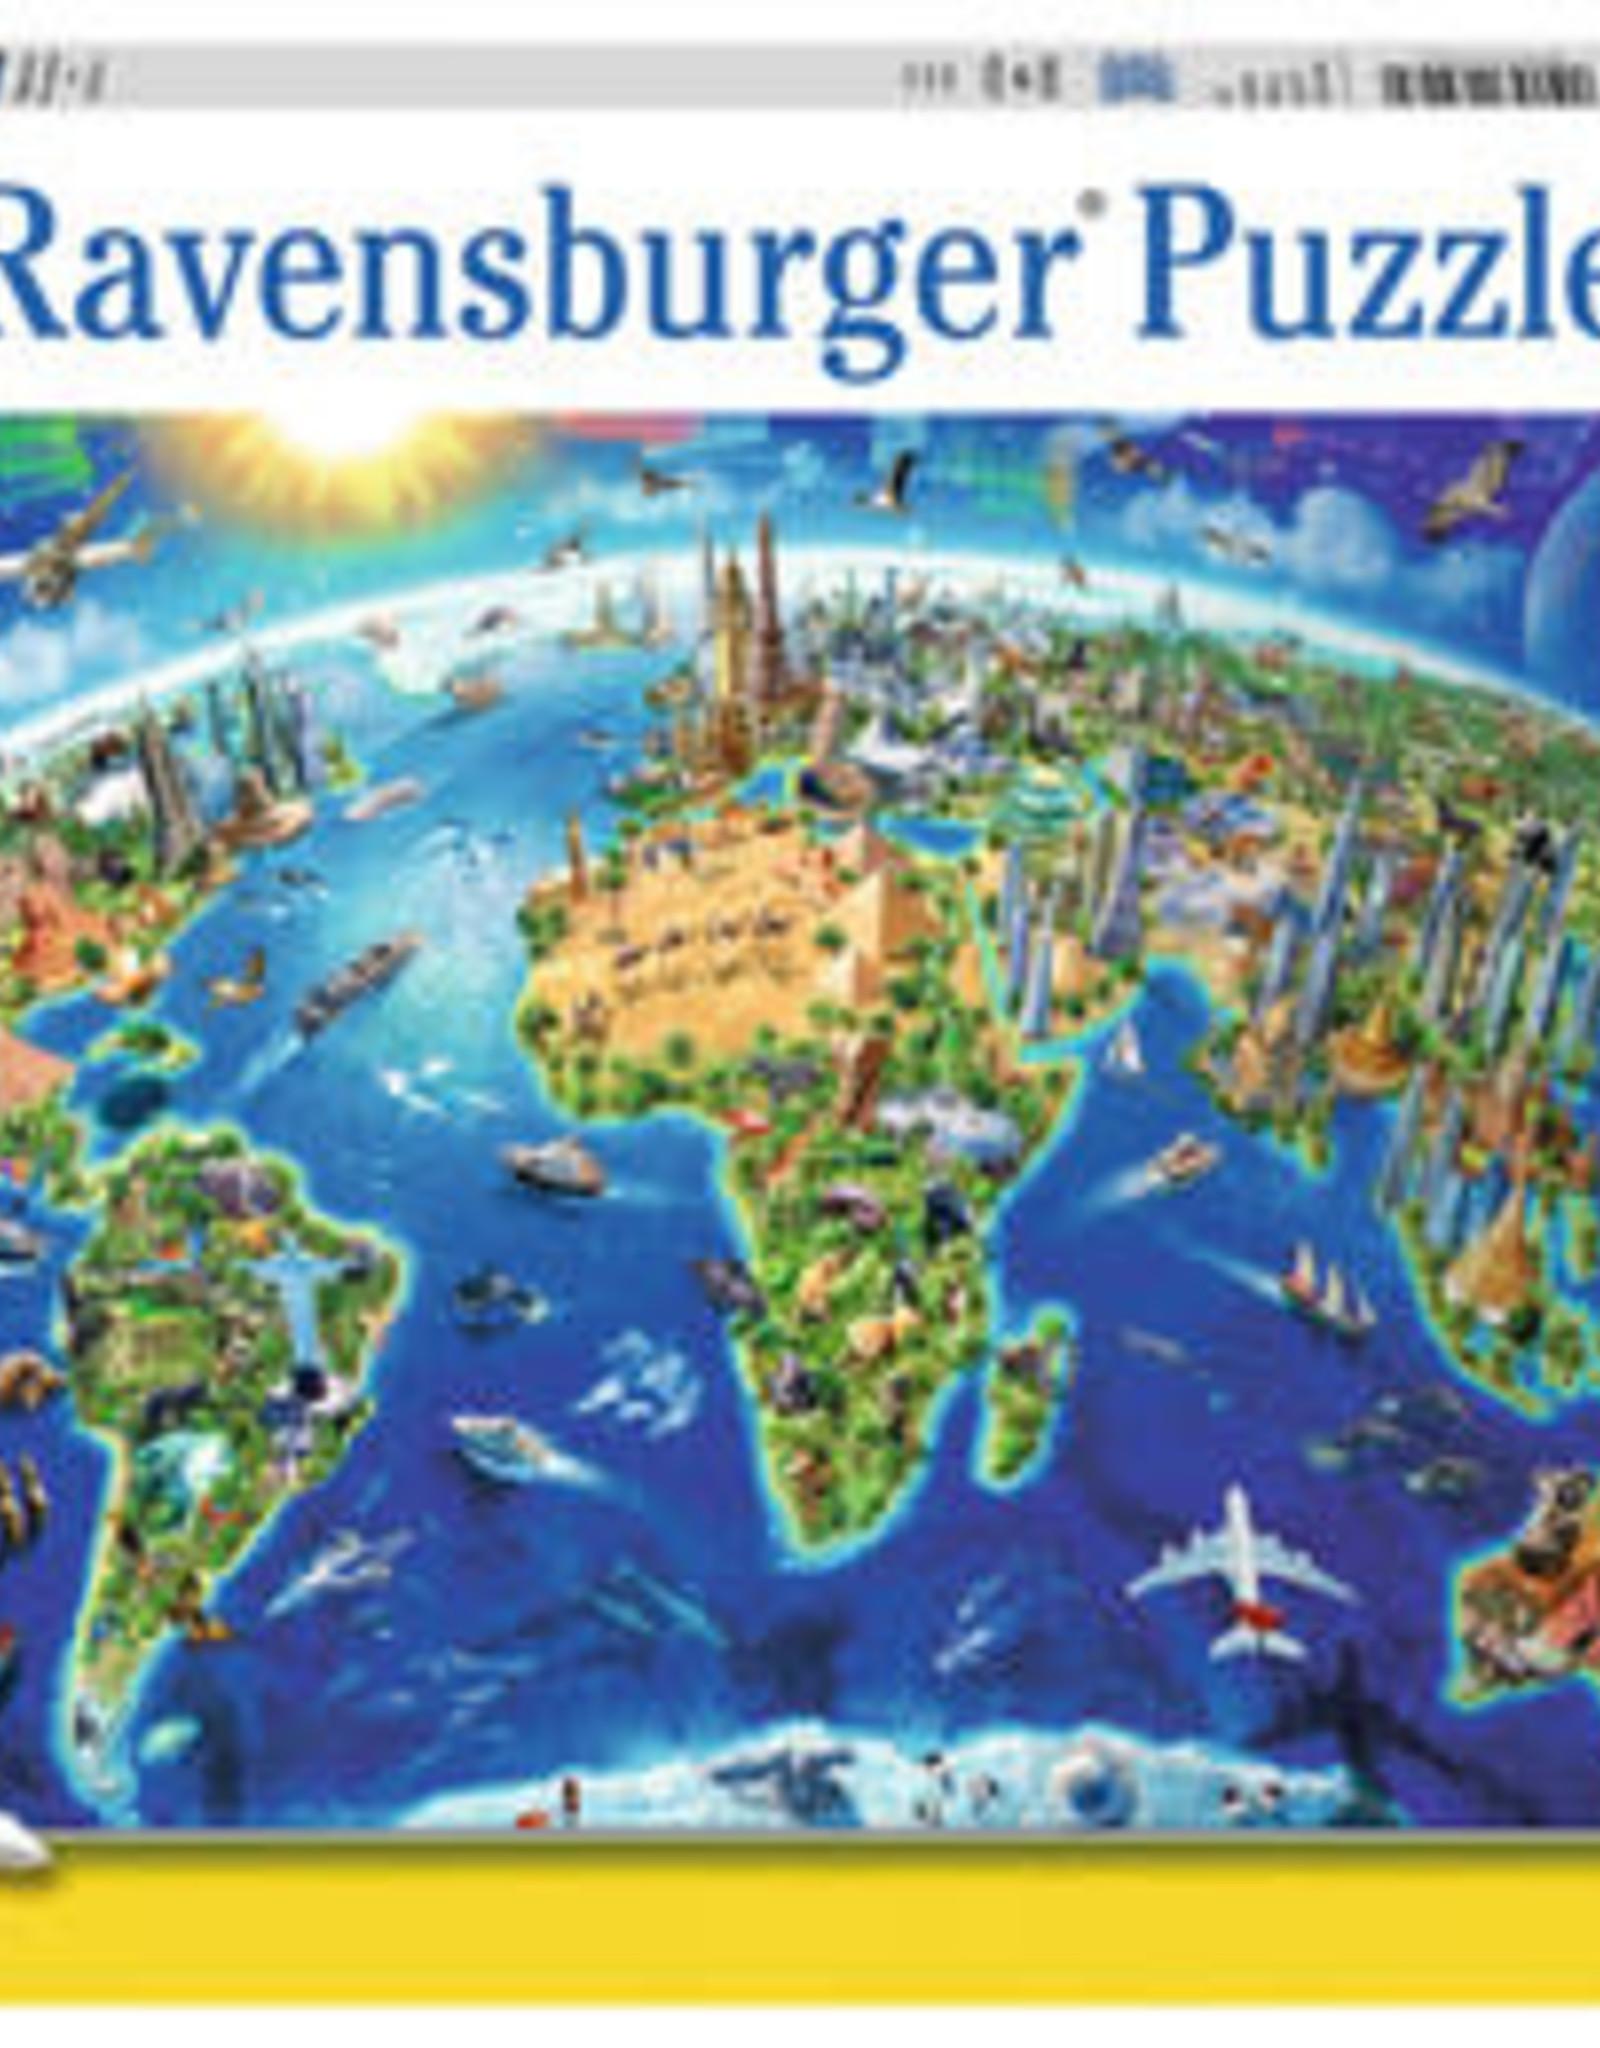 Ravensburger Puzzle 300 pc XXL: World Landmarks Map XXL 300p